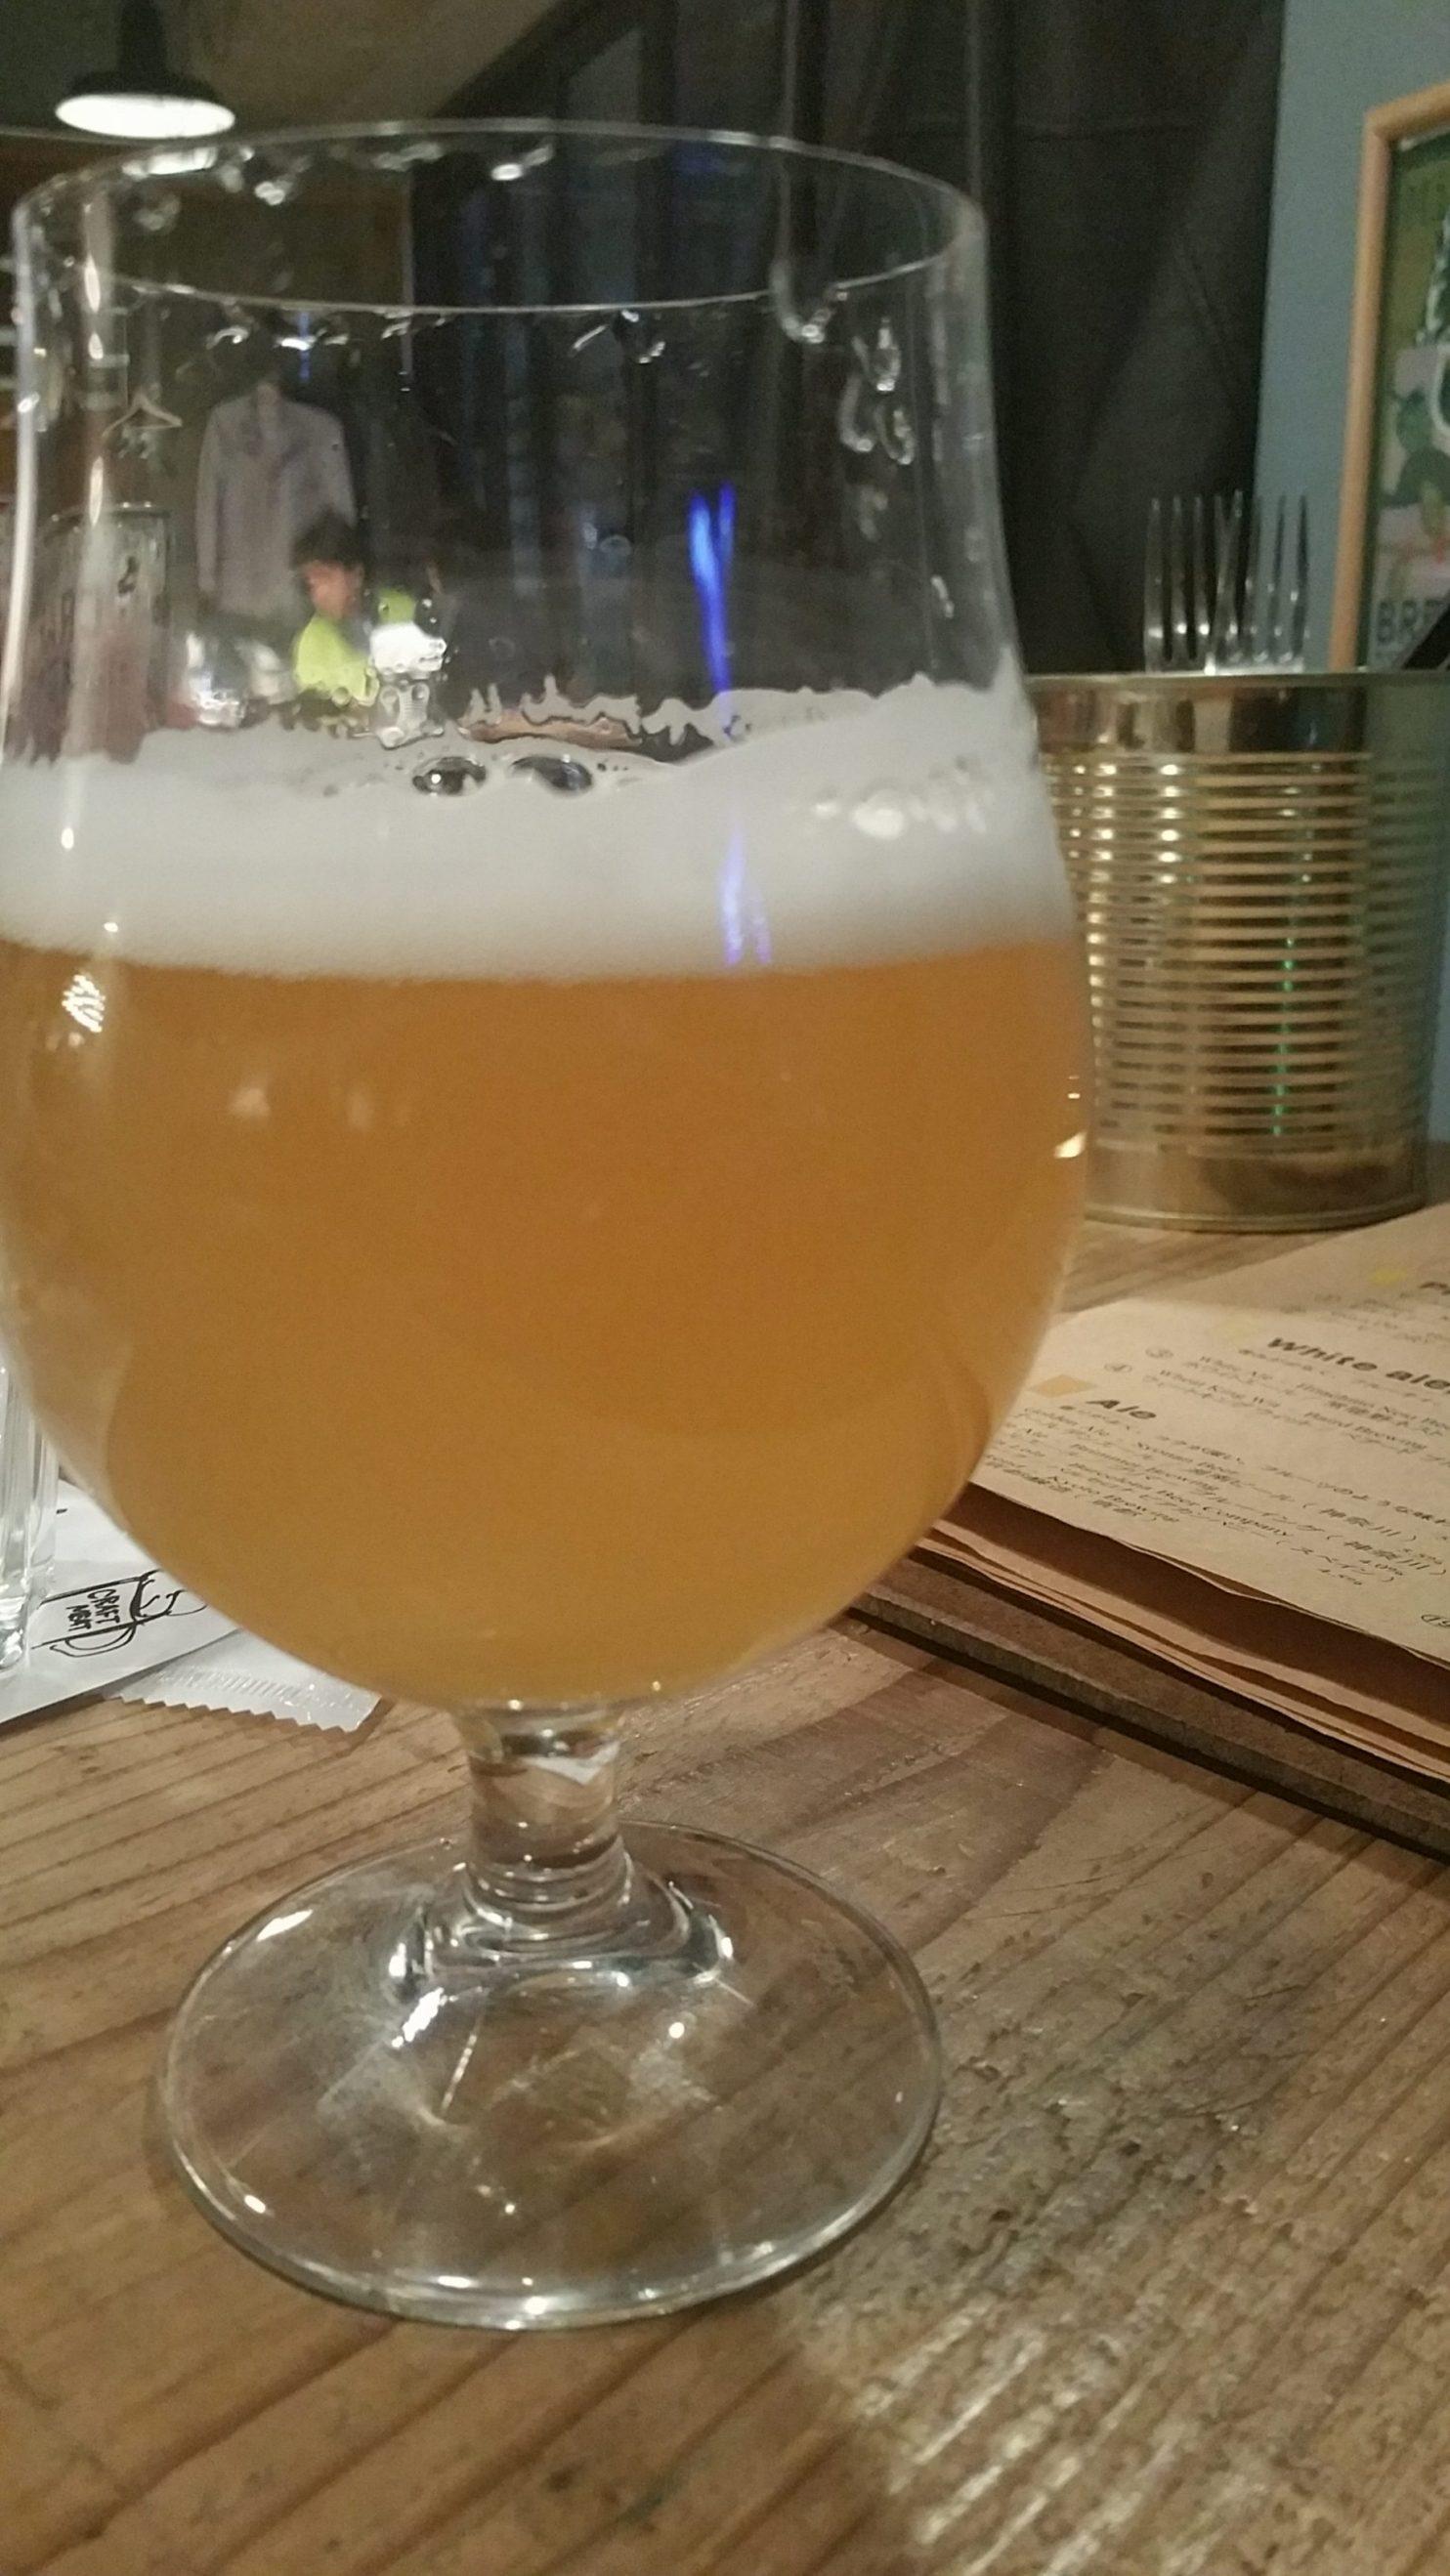 Shonan Beer Sakura Gose 湘南さくらゴーゼ